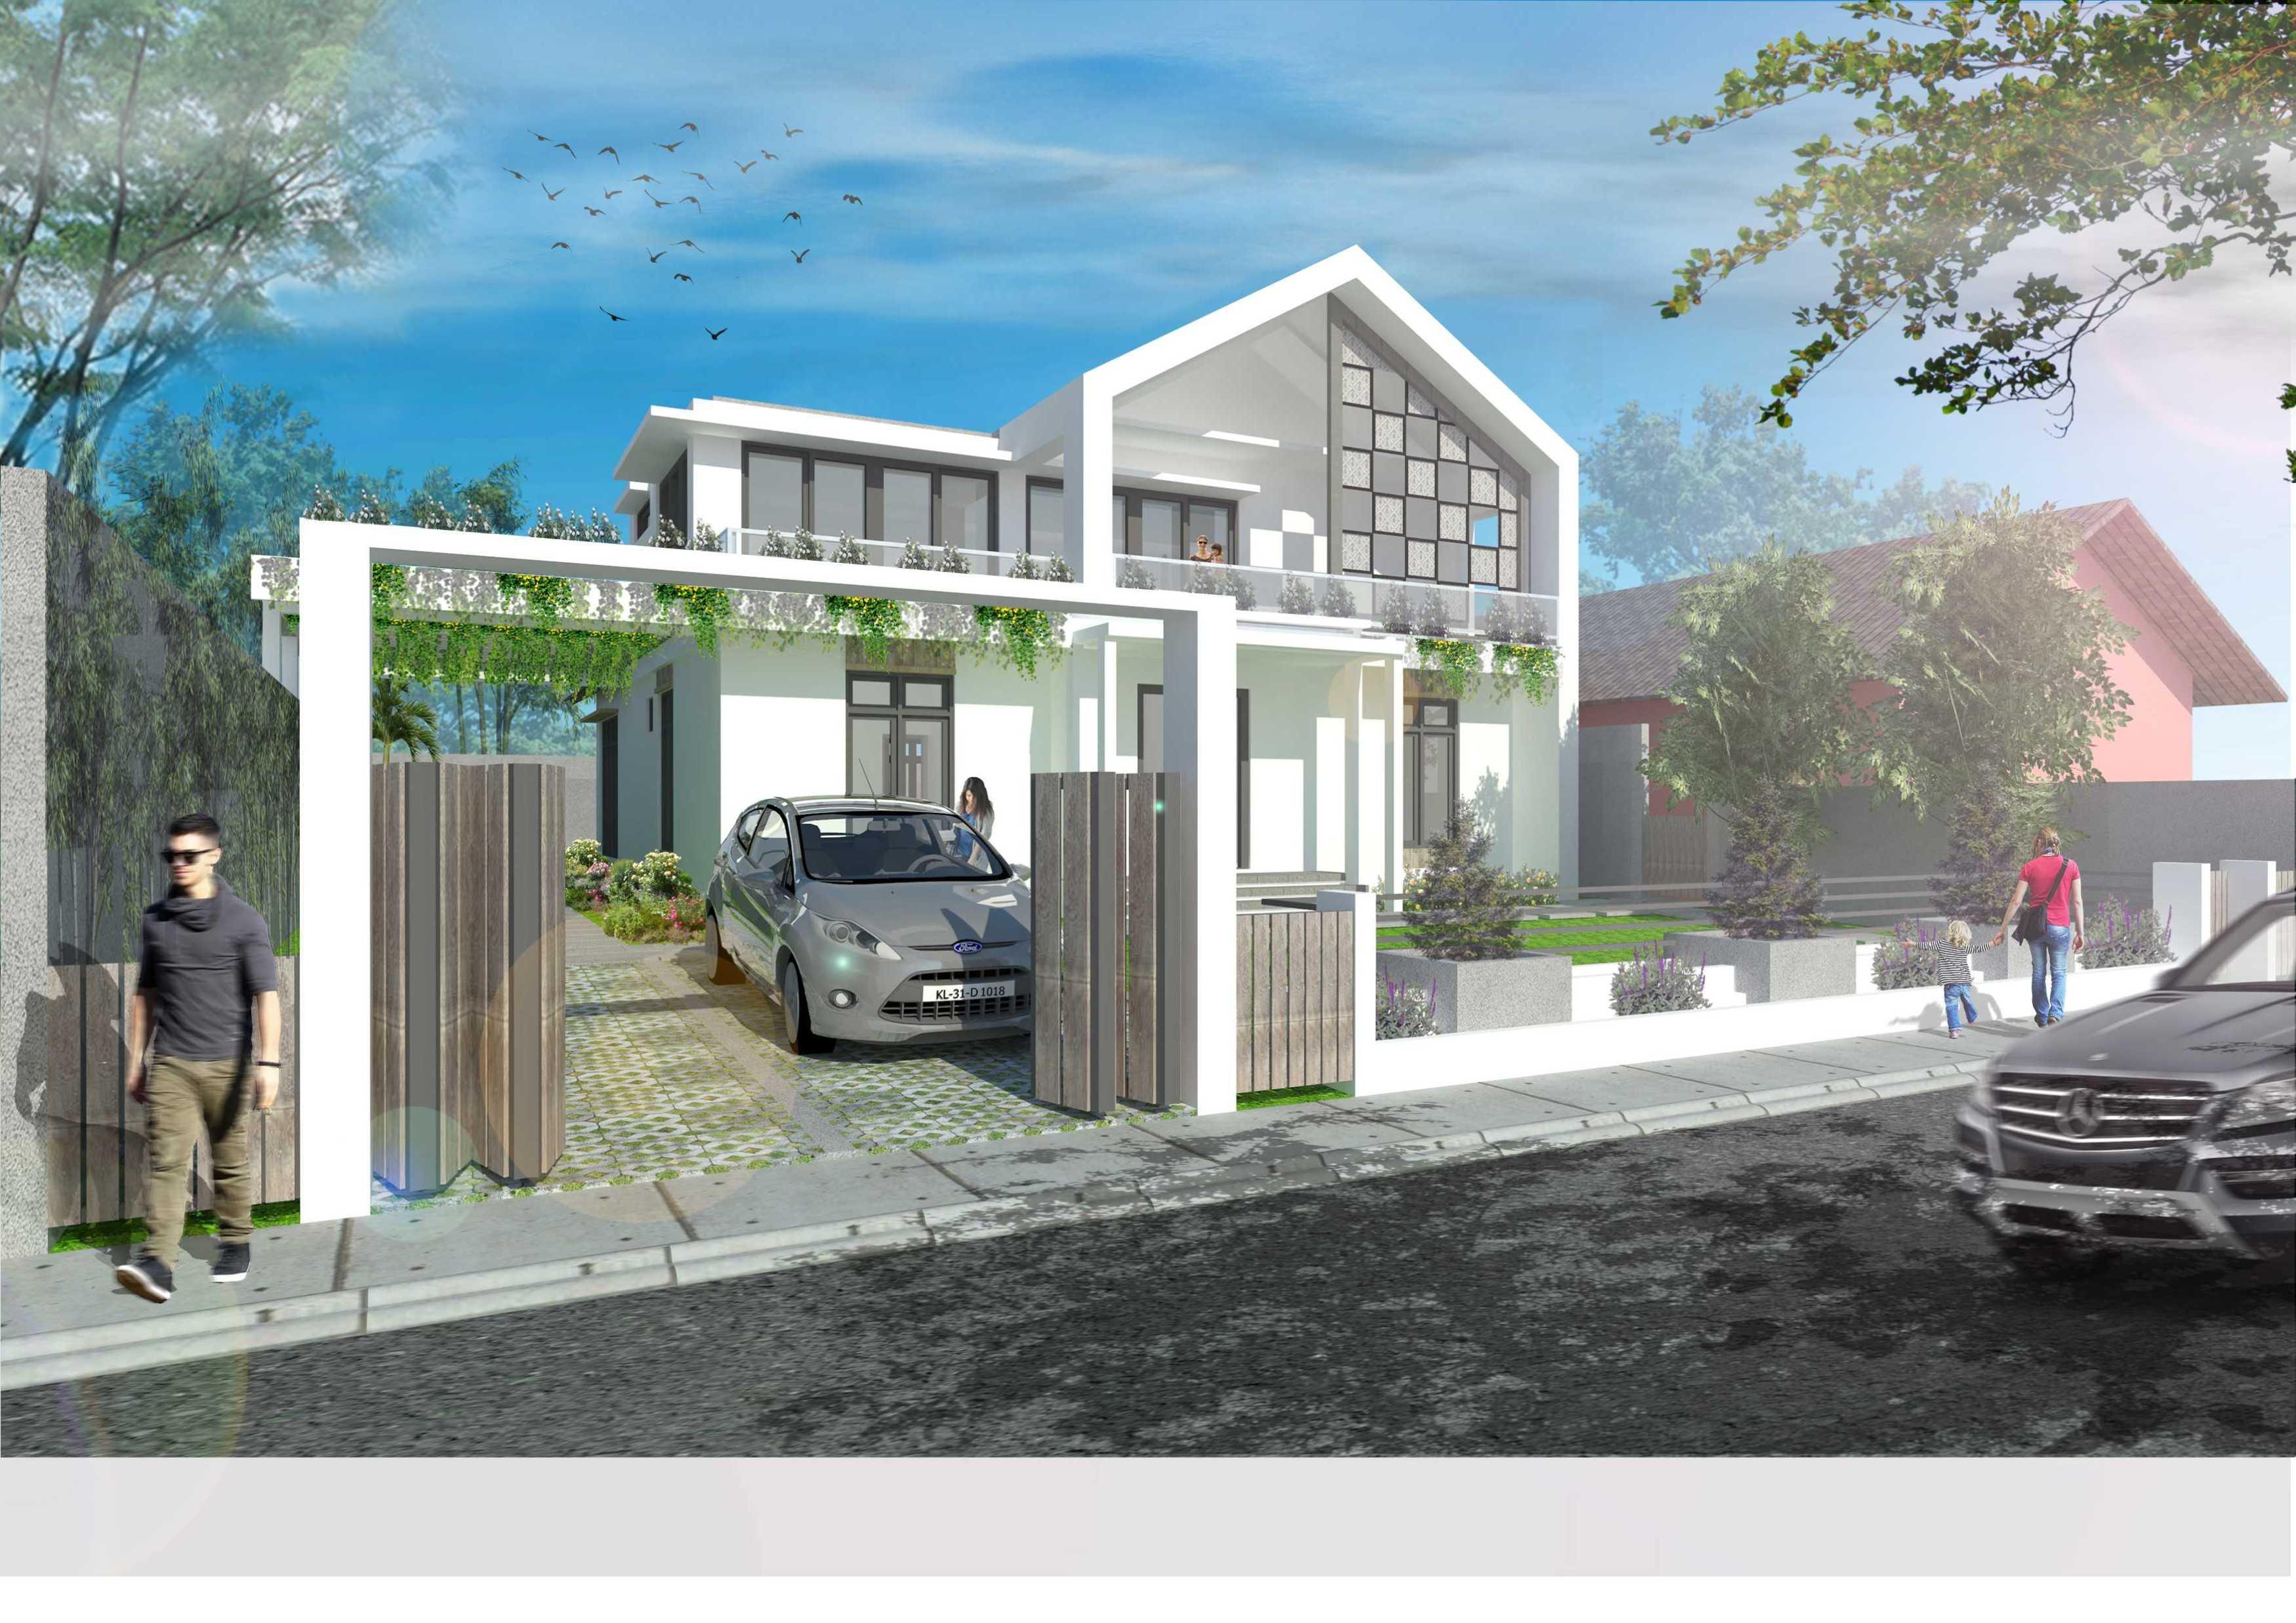 Idea Arsitektur T-House Kamang Magek, Kabupaten Agam, Sumatera Barat, Indonesia Kamang Magek, Kabupaten Agam, Sumatera Barat, Indonesia Idea-Arsitektur-T-House   66722